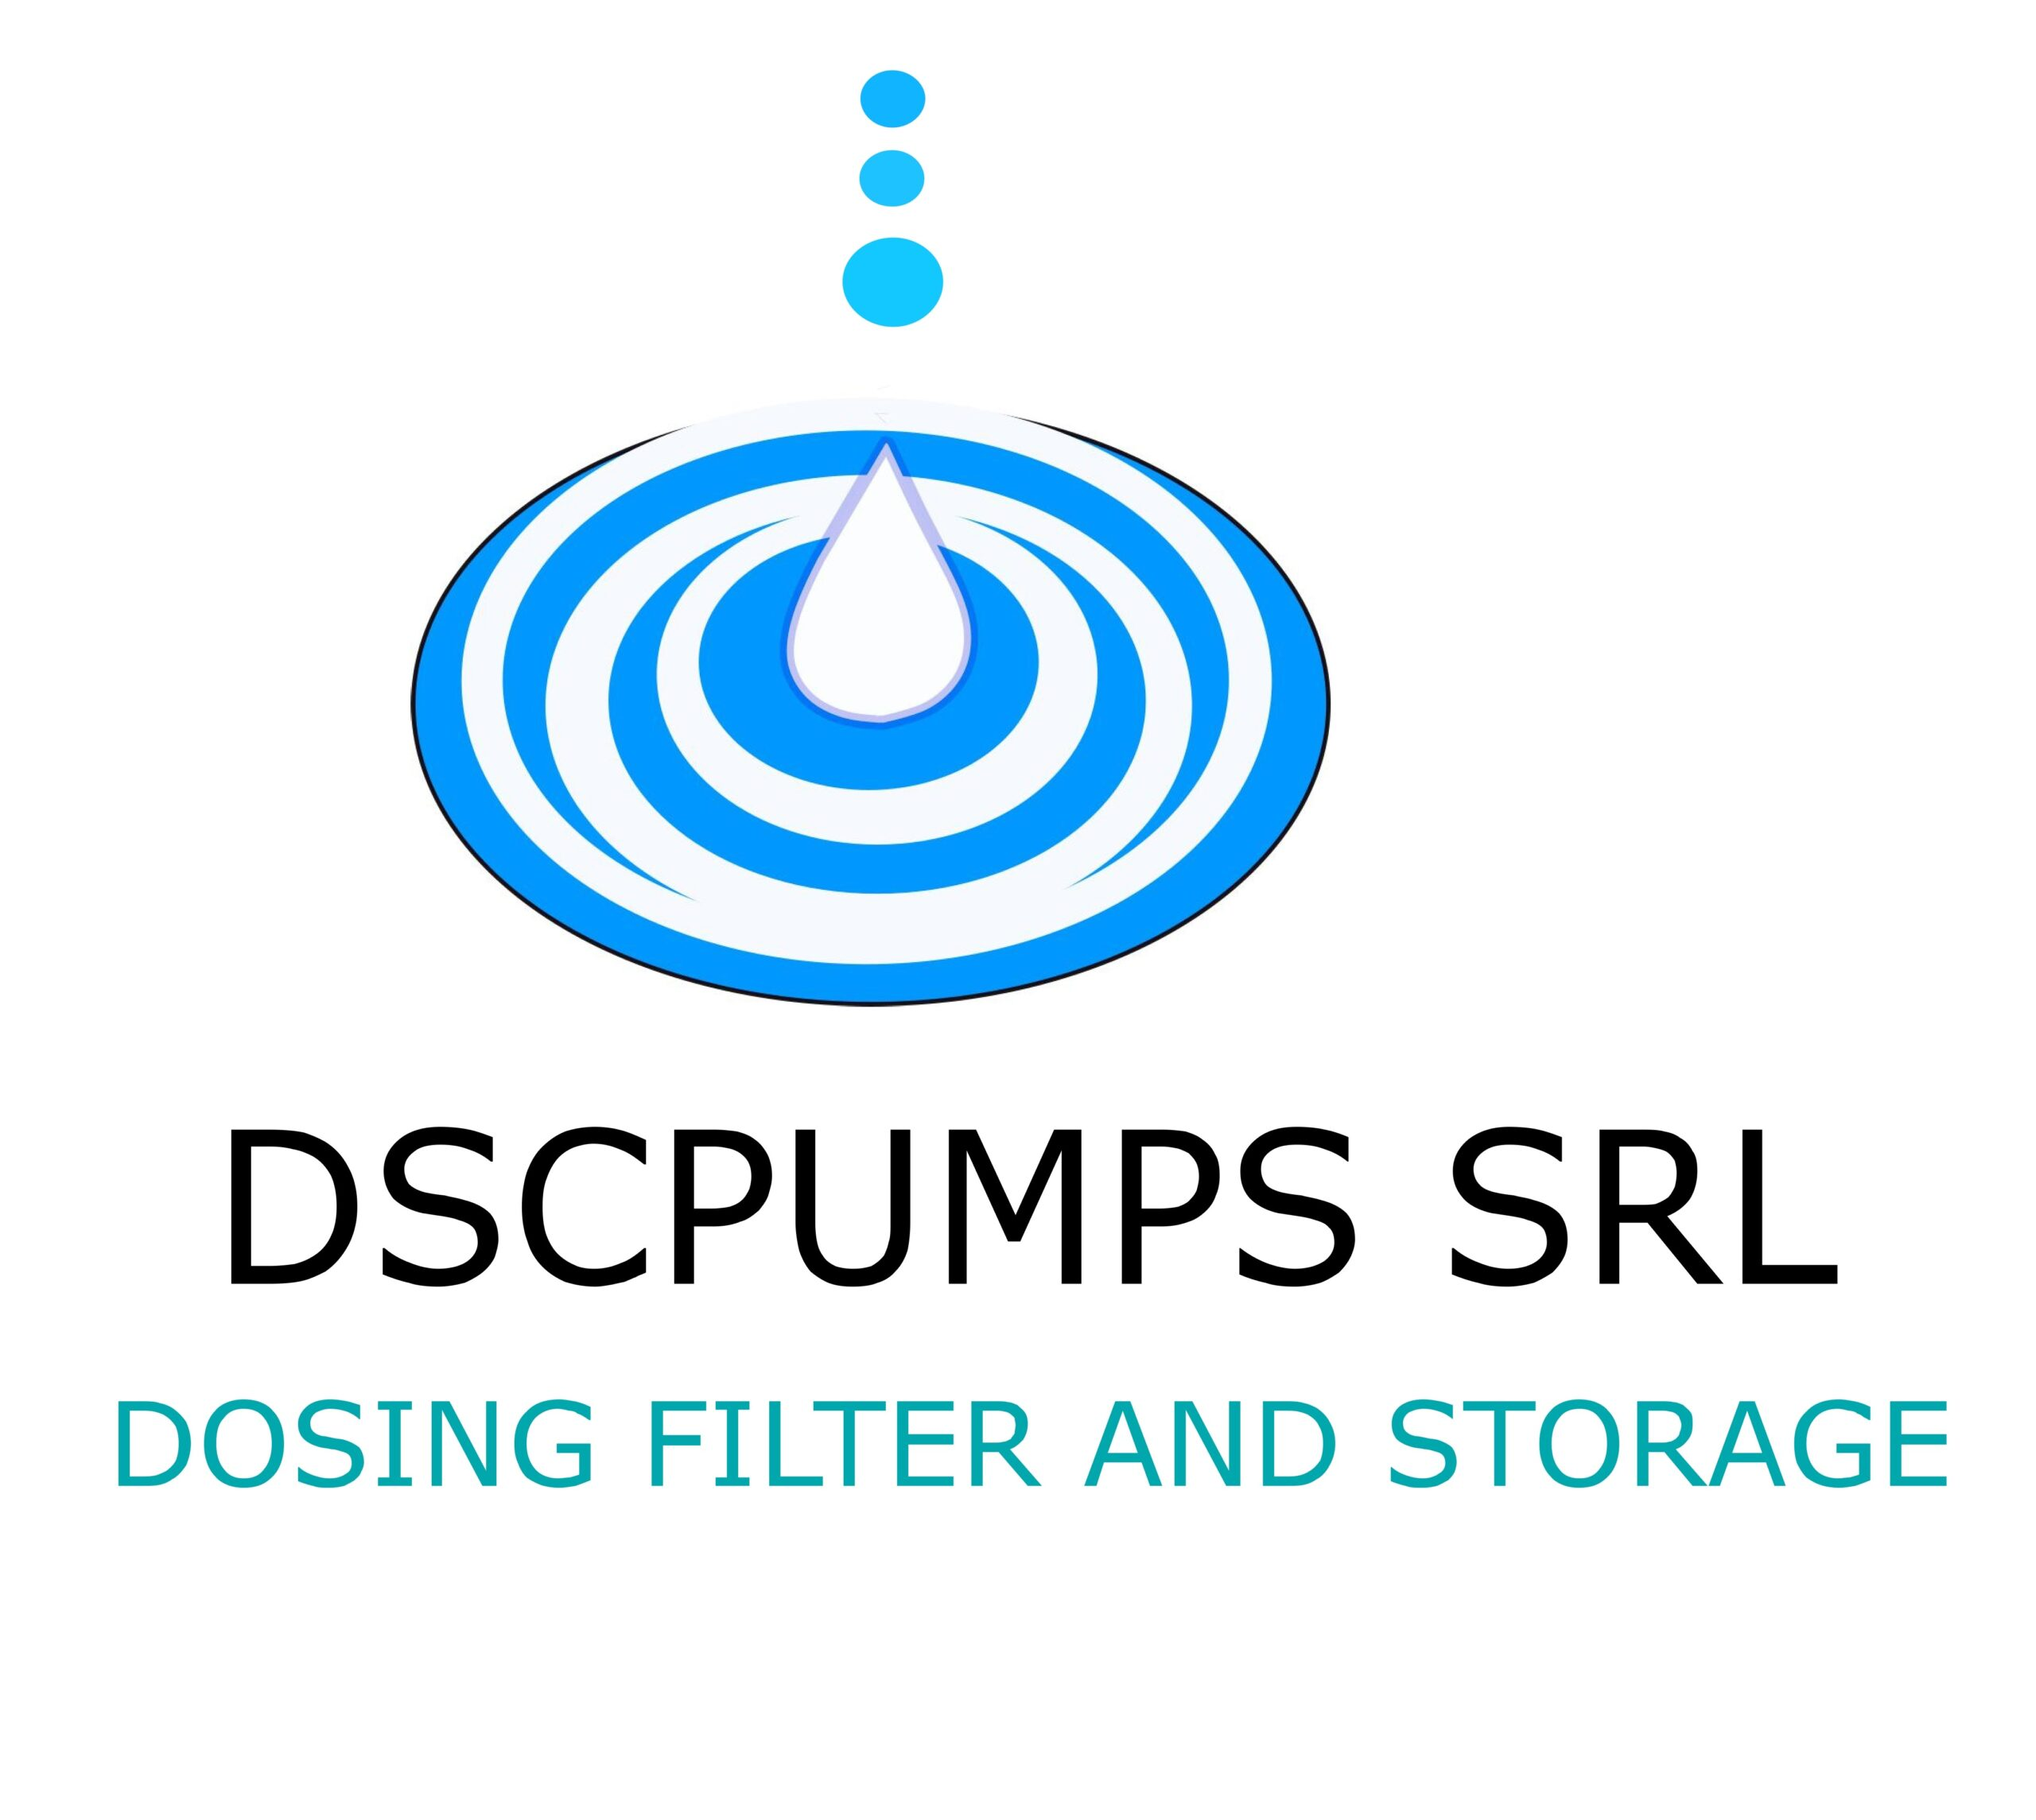 dscpumps.it